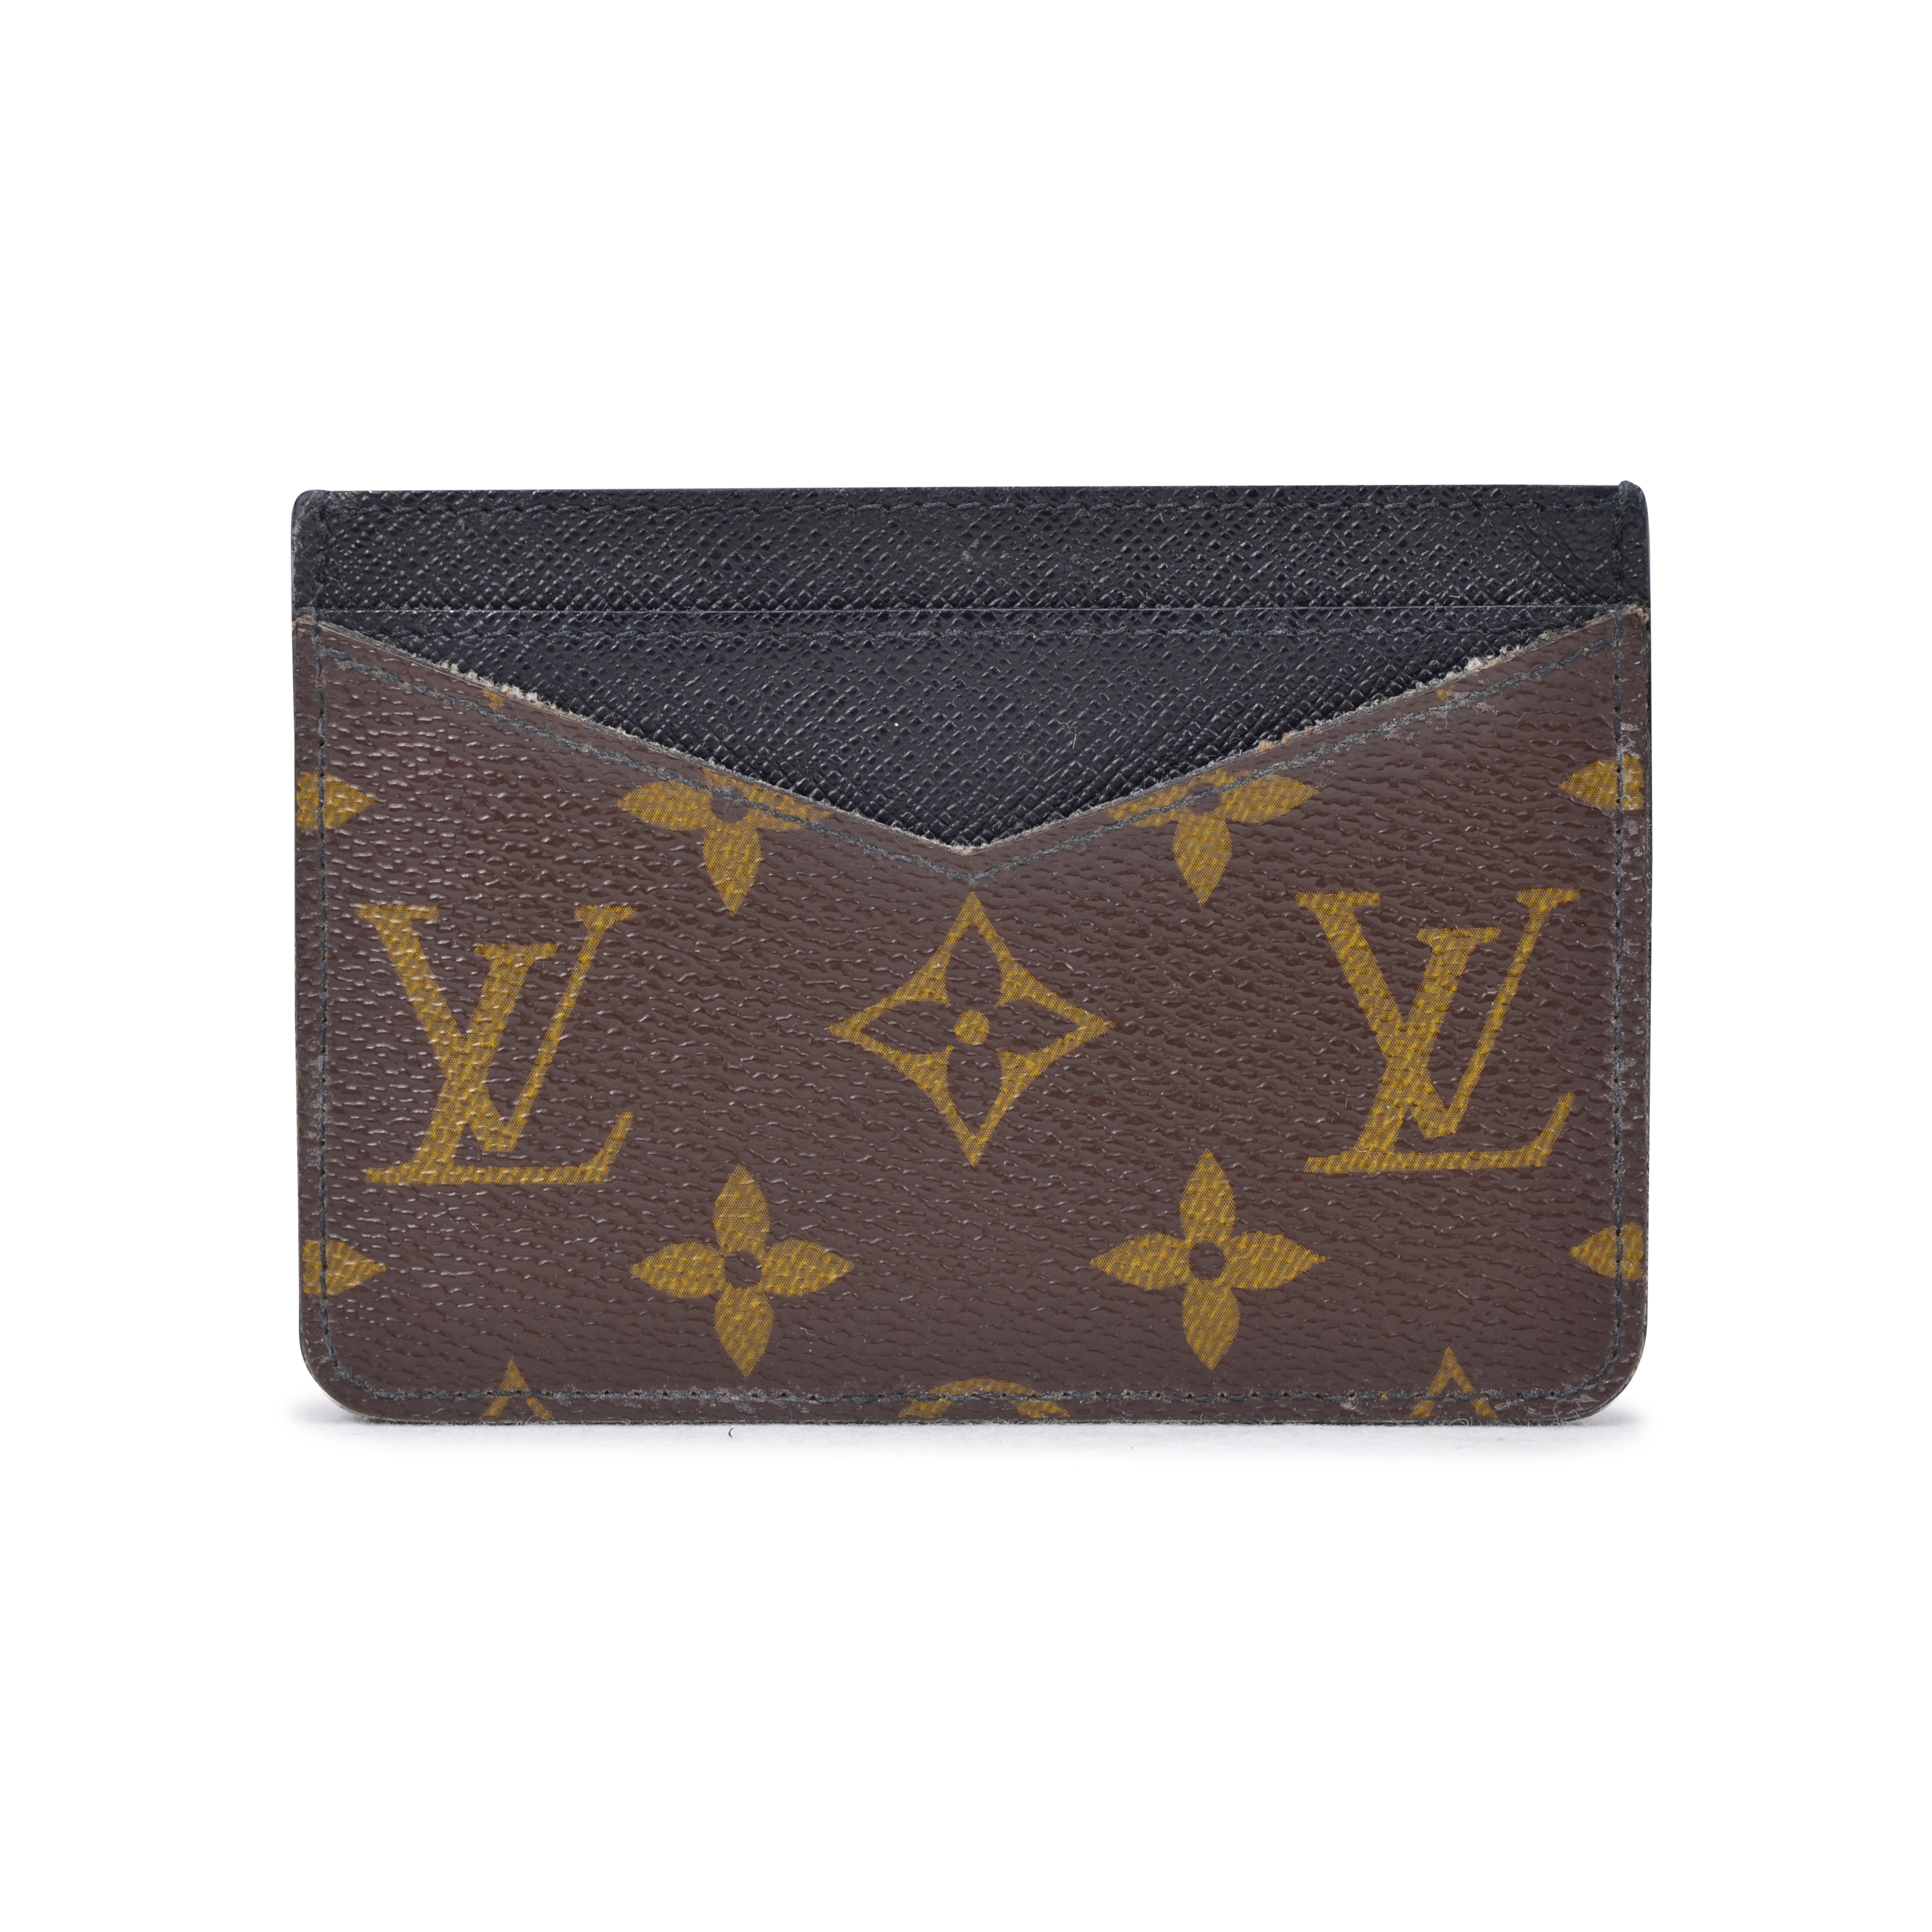 d0533bc33d4b Authentic Second Hand Louis Vuitton Monogram Card Holder (PSS-332-00004)